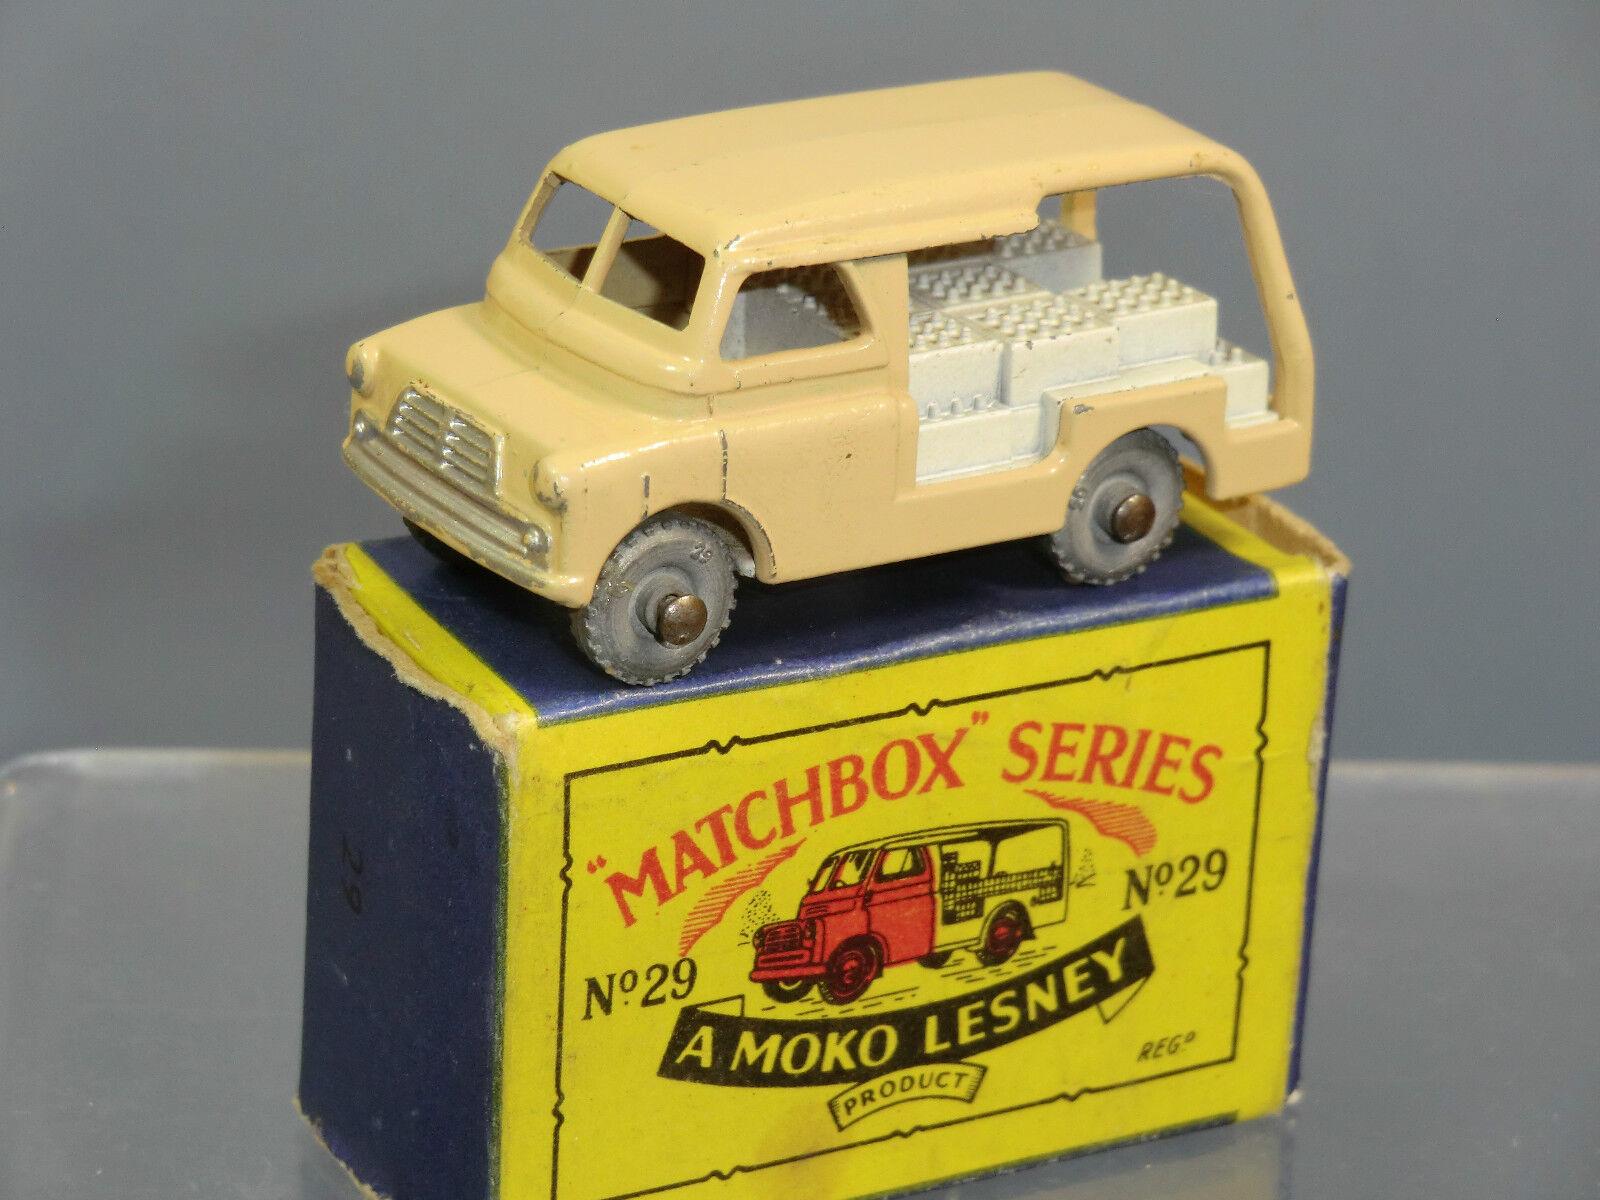 MATCHBOX Lesney Moko modello No.29a BEDFORD latte consegna Van VN Nuovo di zecca con scatola